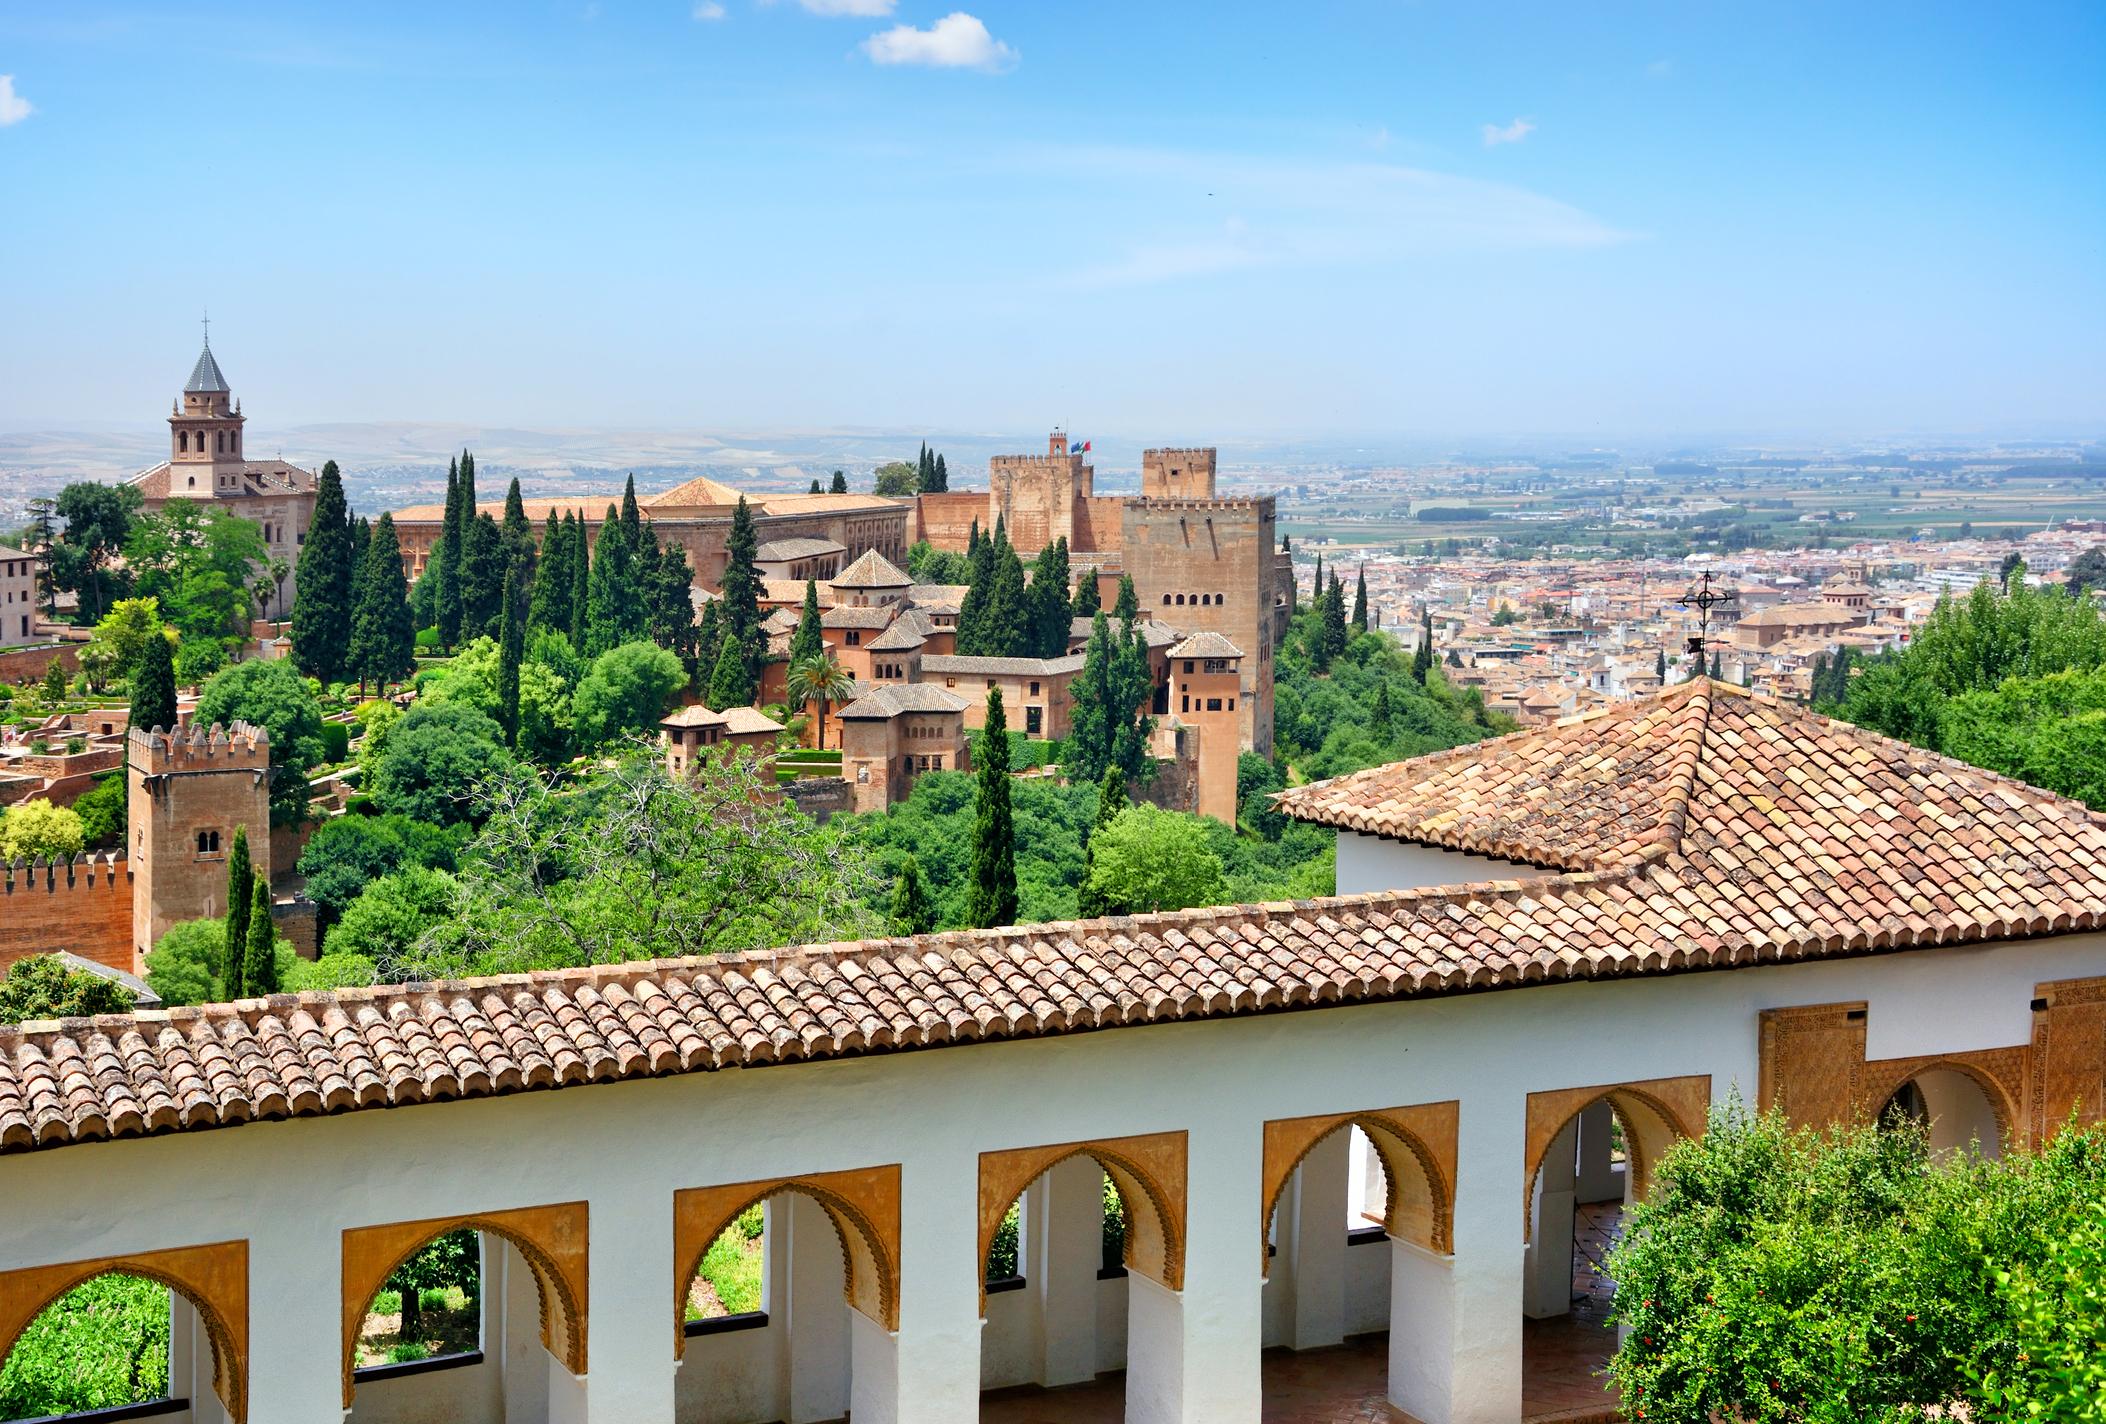 Vista dell' Alhambra dal Generalife